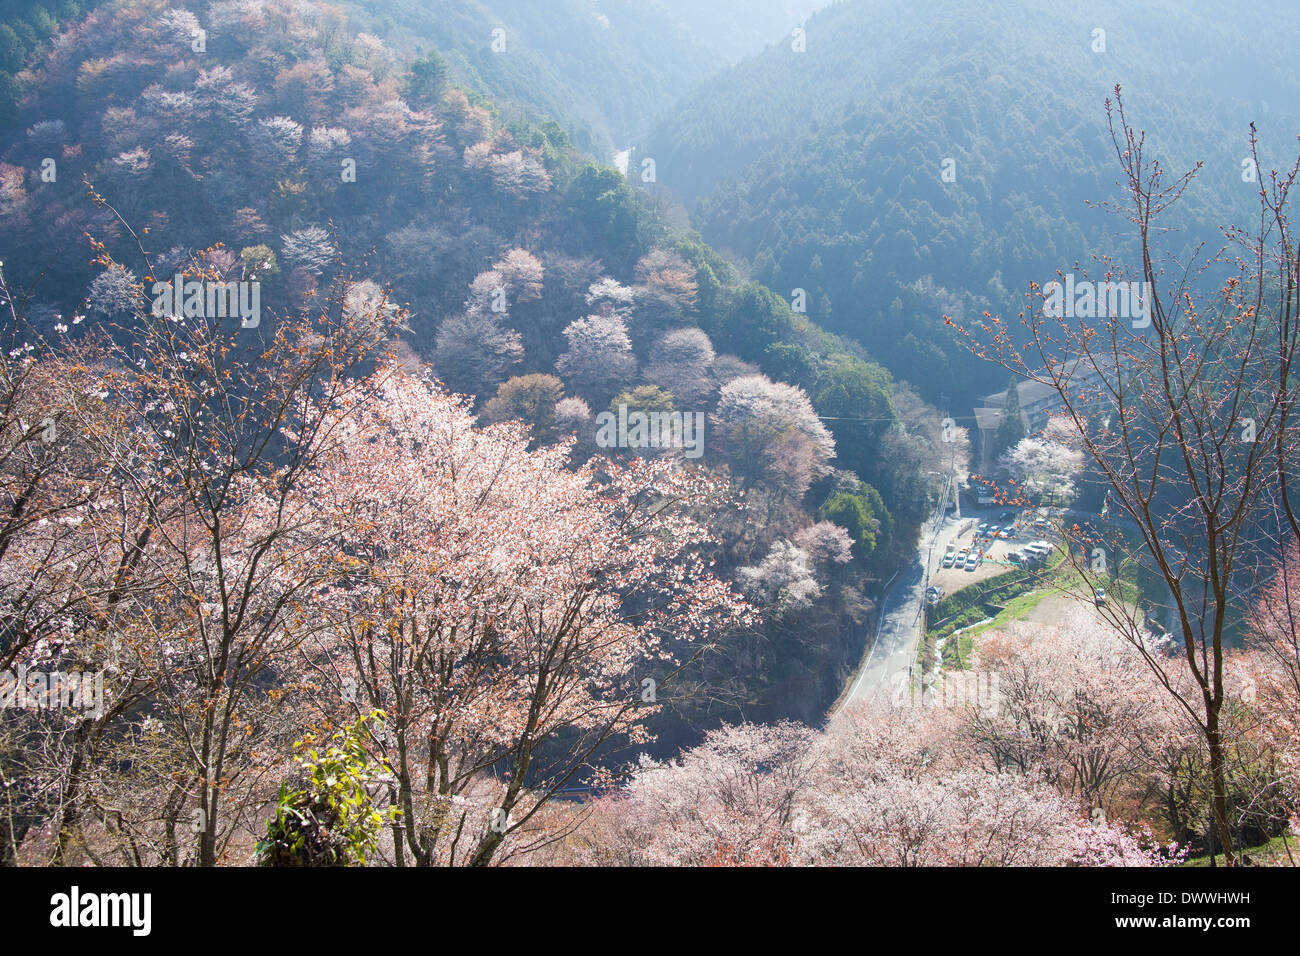 Cherry trees in Mt Yoshino, Nara Prefecture, Japan - Stock Image